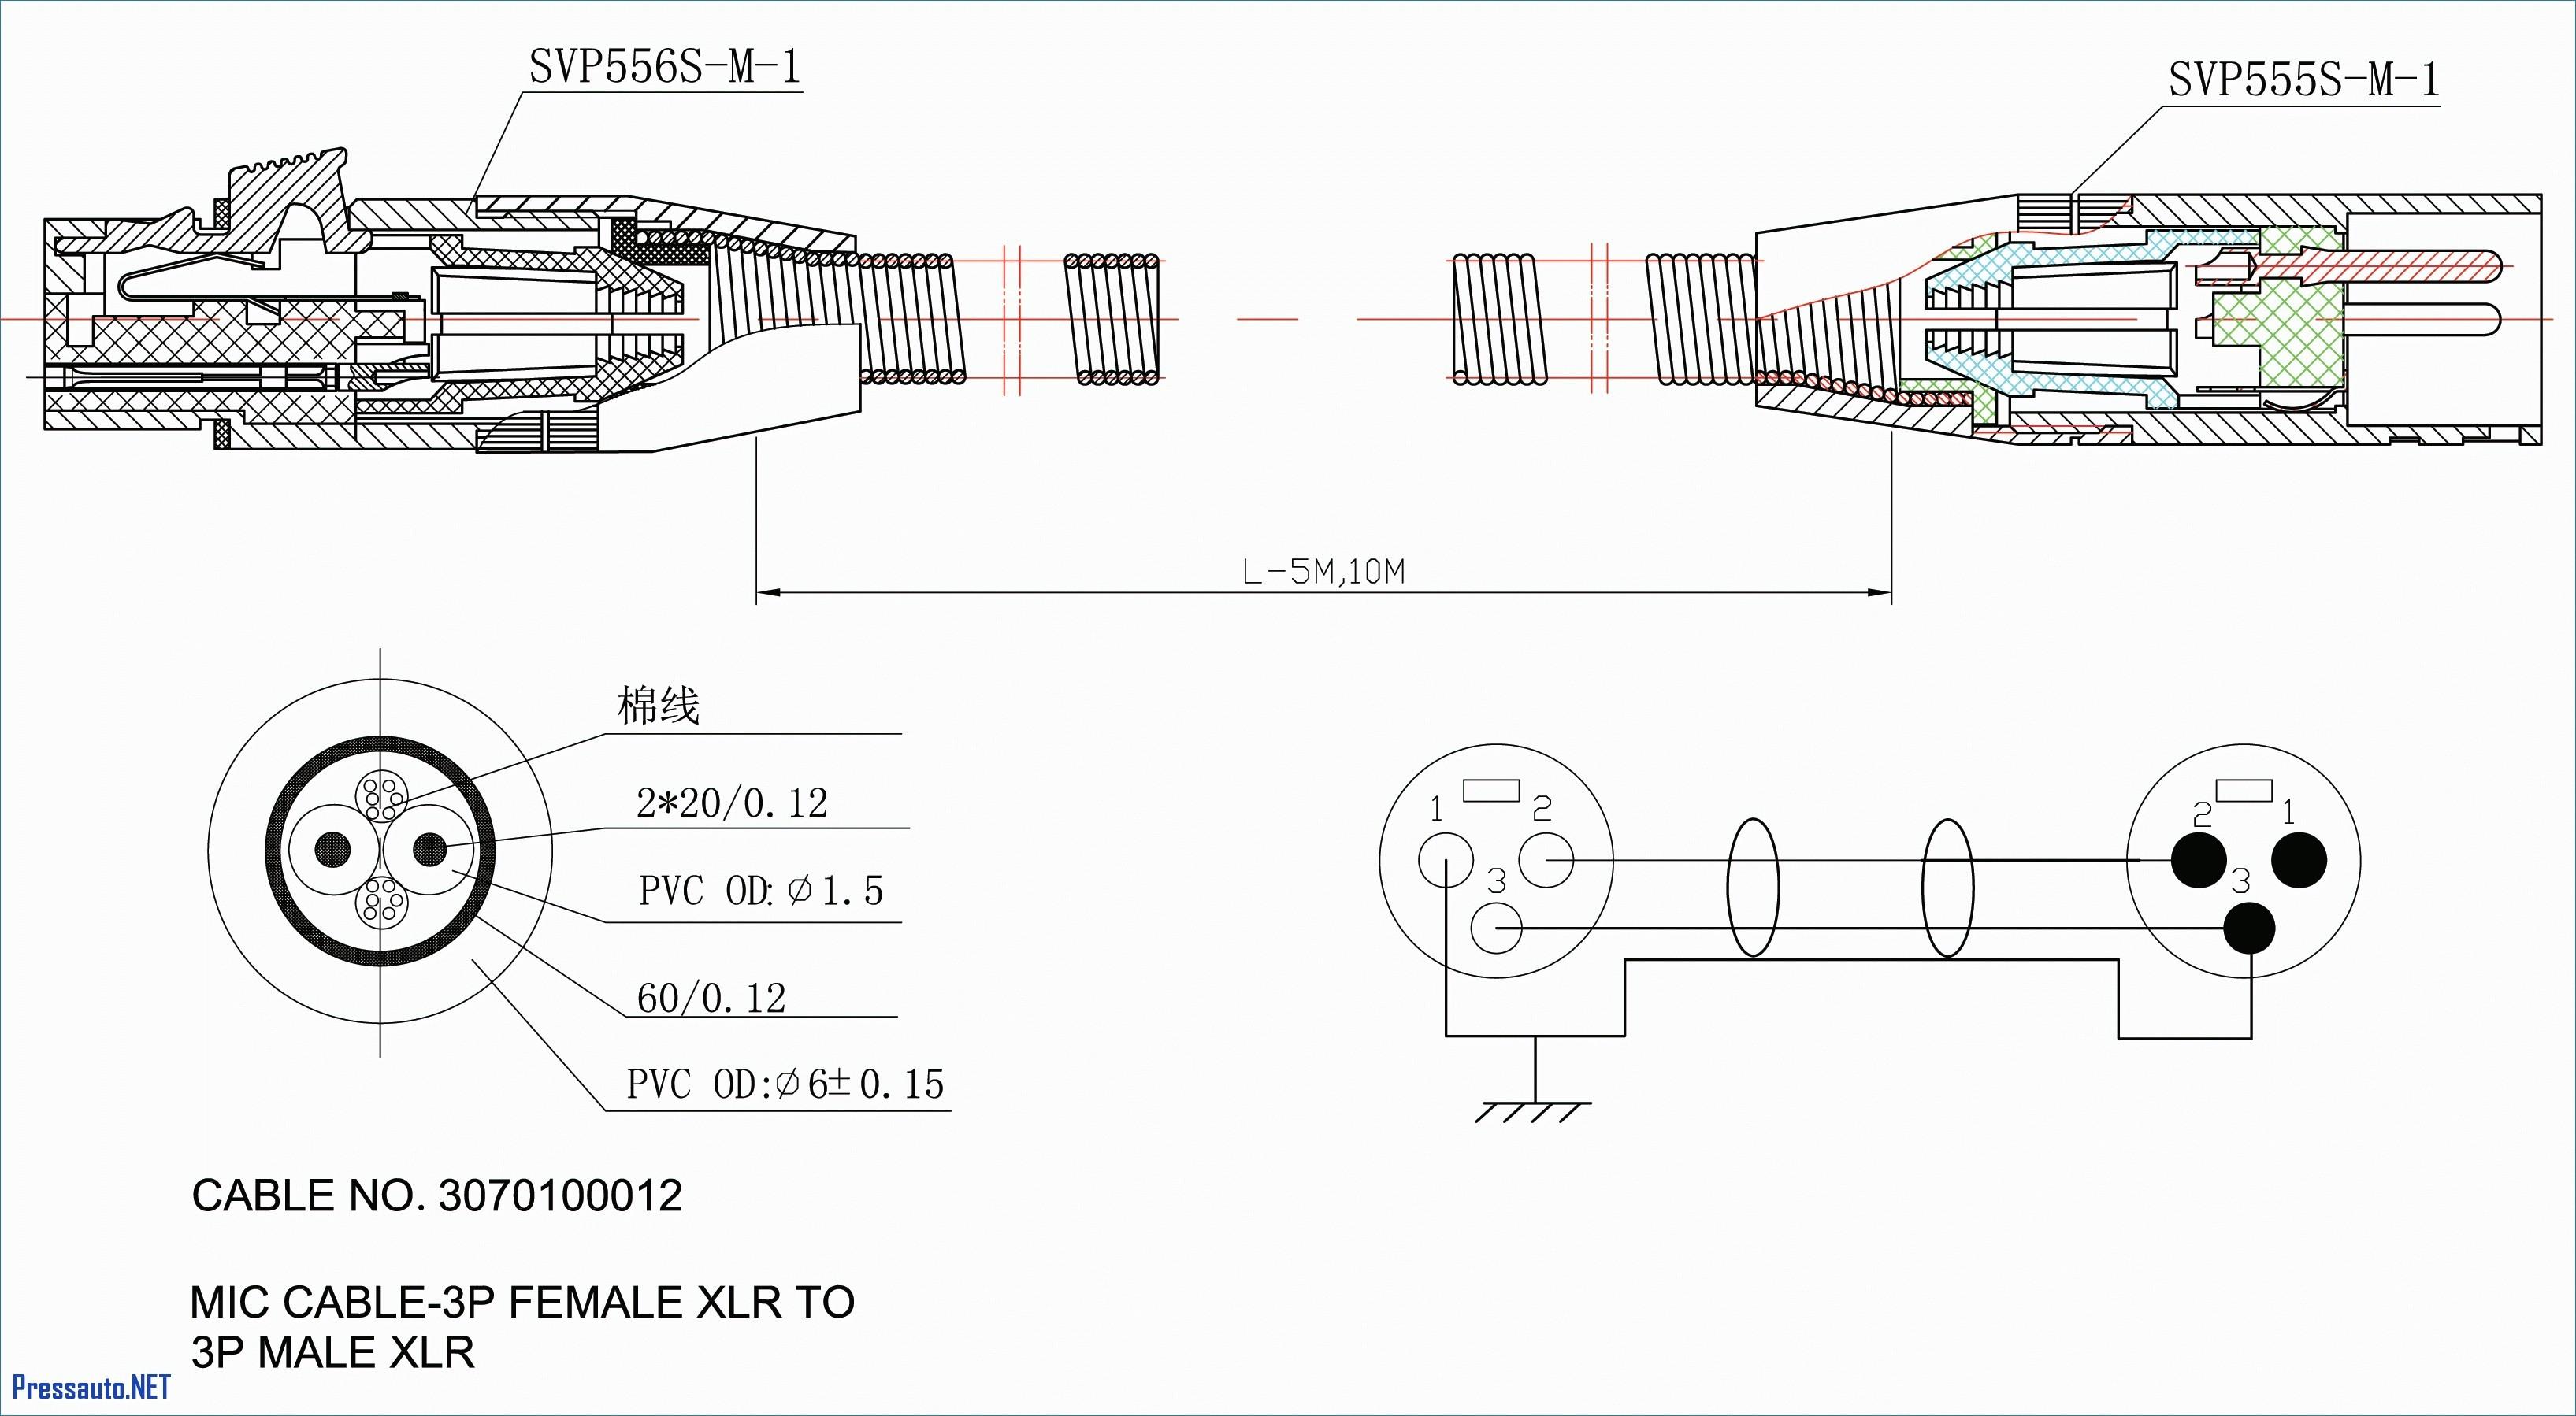 Ferrari Engine Diagram Ferrari F355 Sub Frame Cradle – Free ... on ferrari 308 gts, ferrari 308 qv wiring,